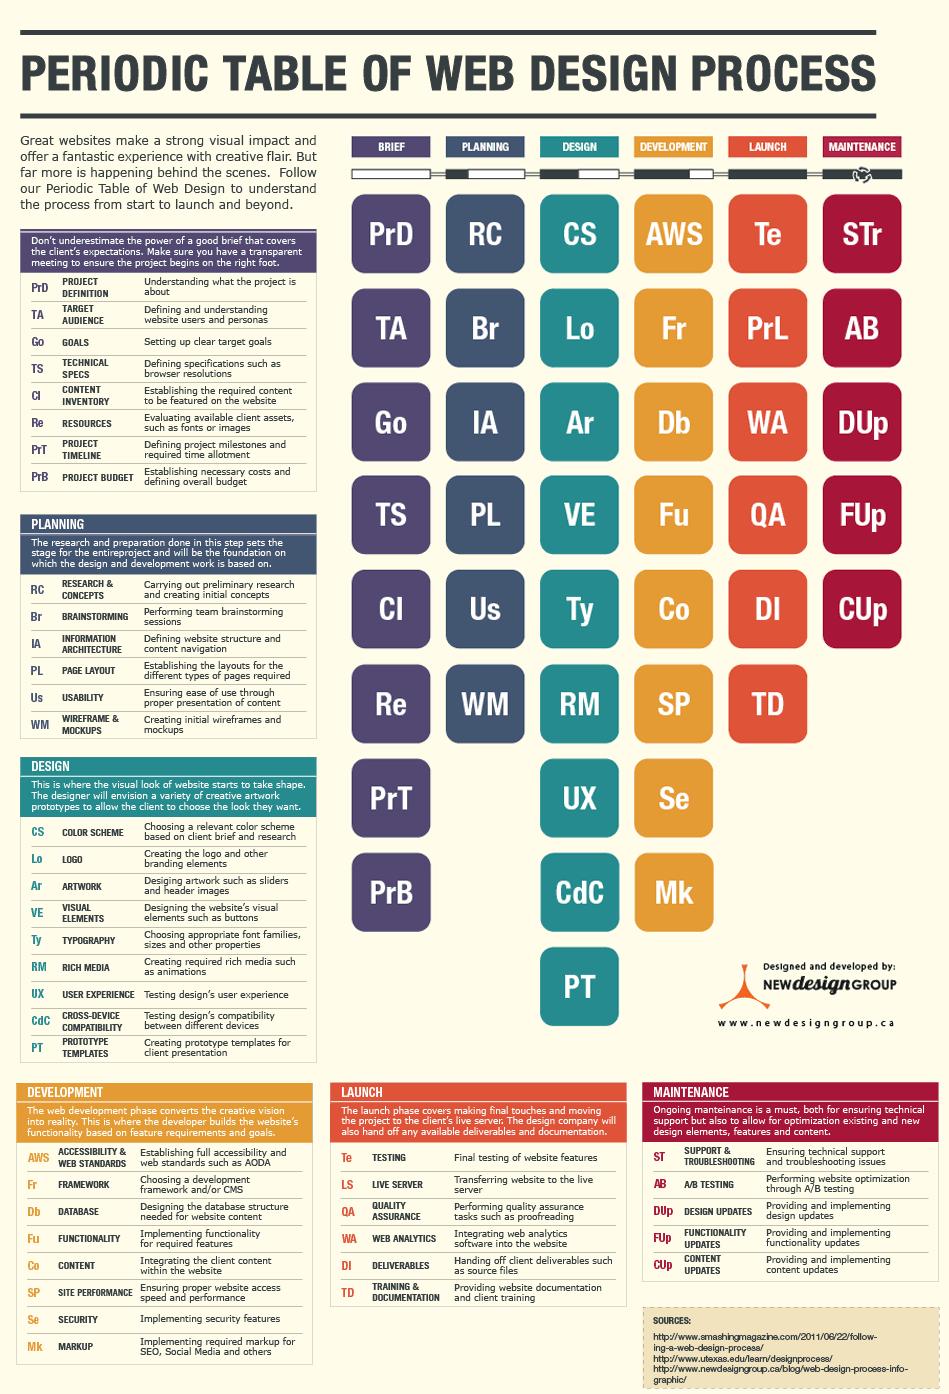 Periodic table of web design process infographic design smm fb periodic table of web design process infographic design smm fb in gamestrikefo Images